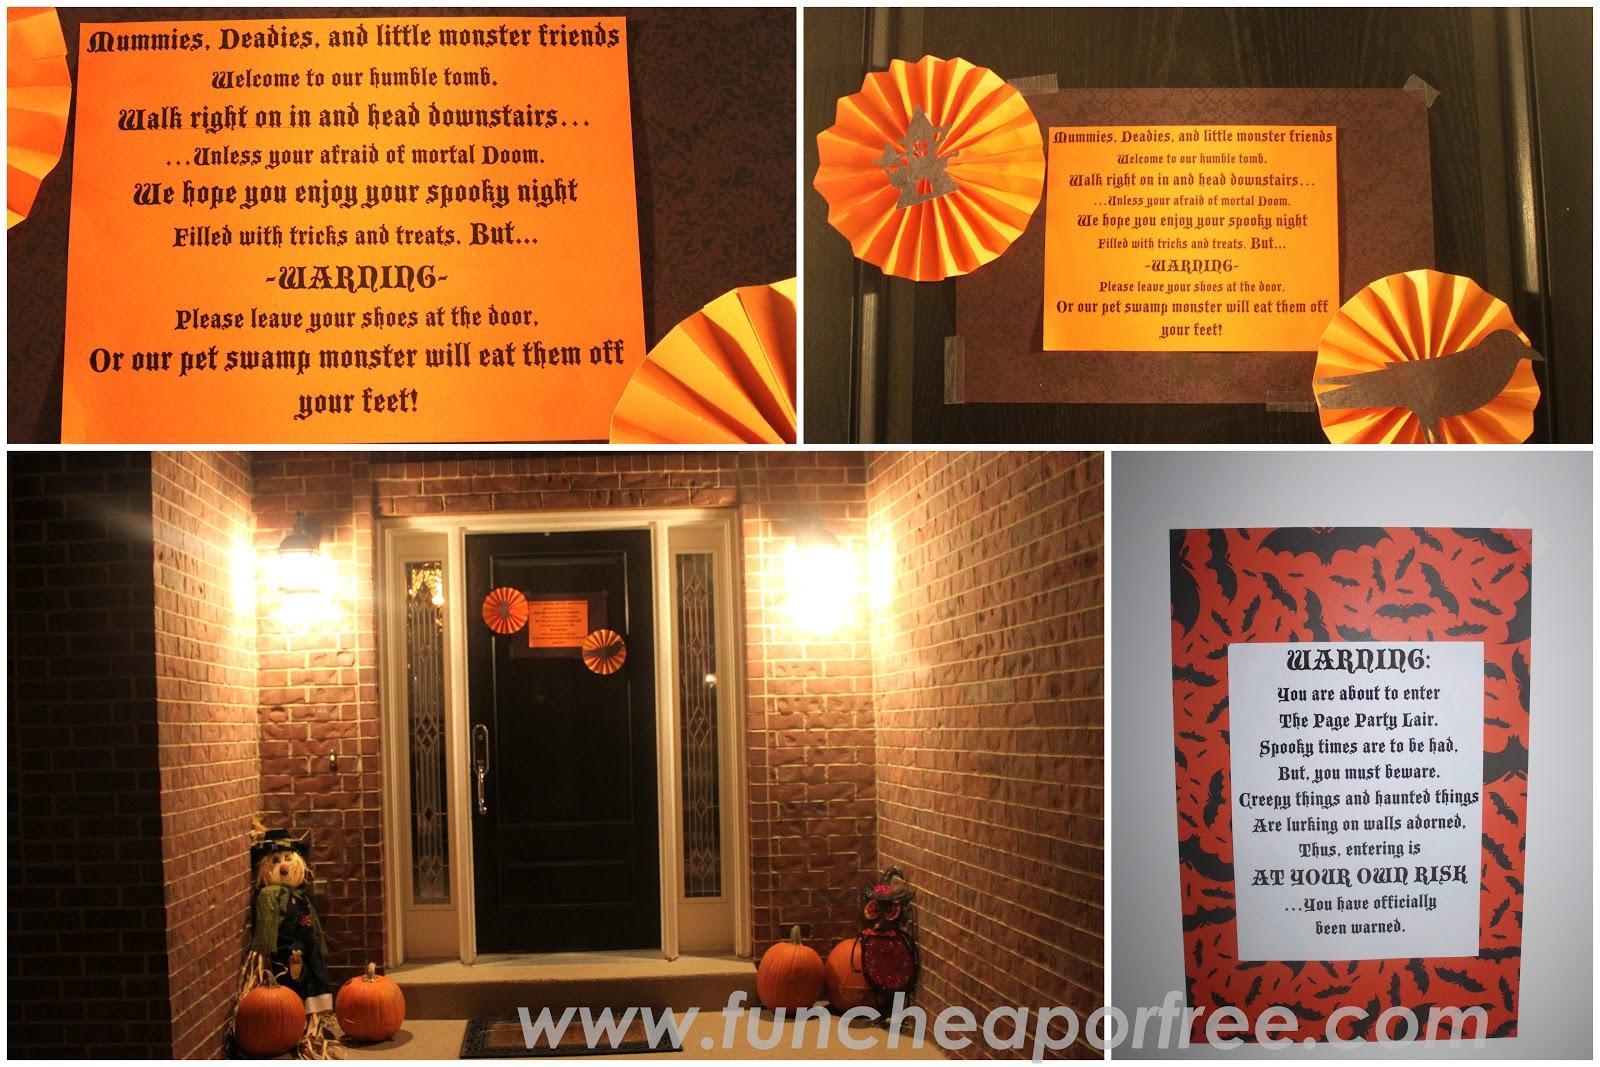 Halloween Party Ideas: fun cheap or free style! - Fun Cheap or Free